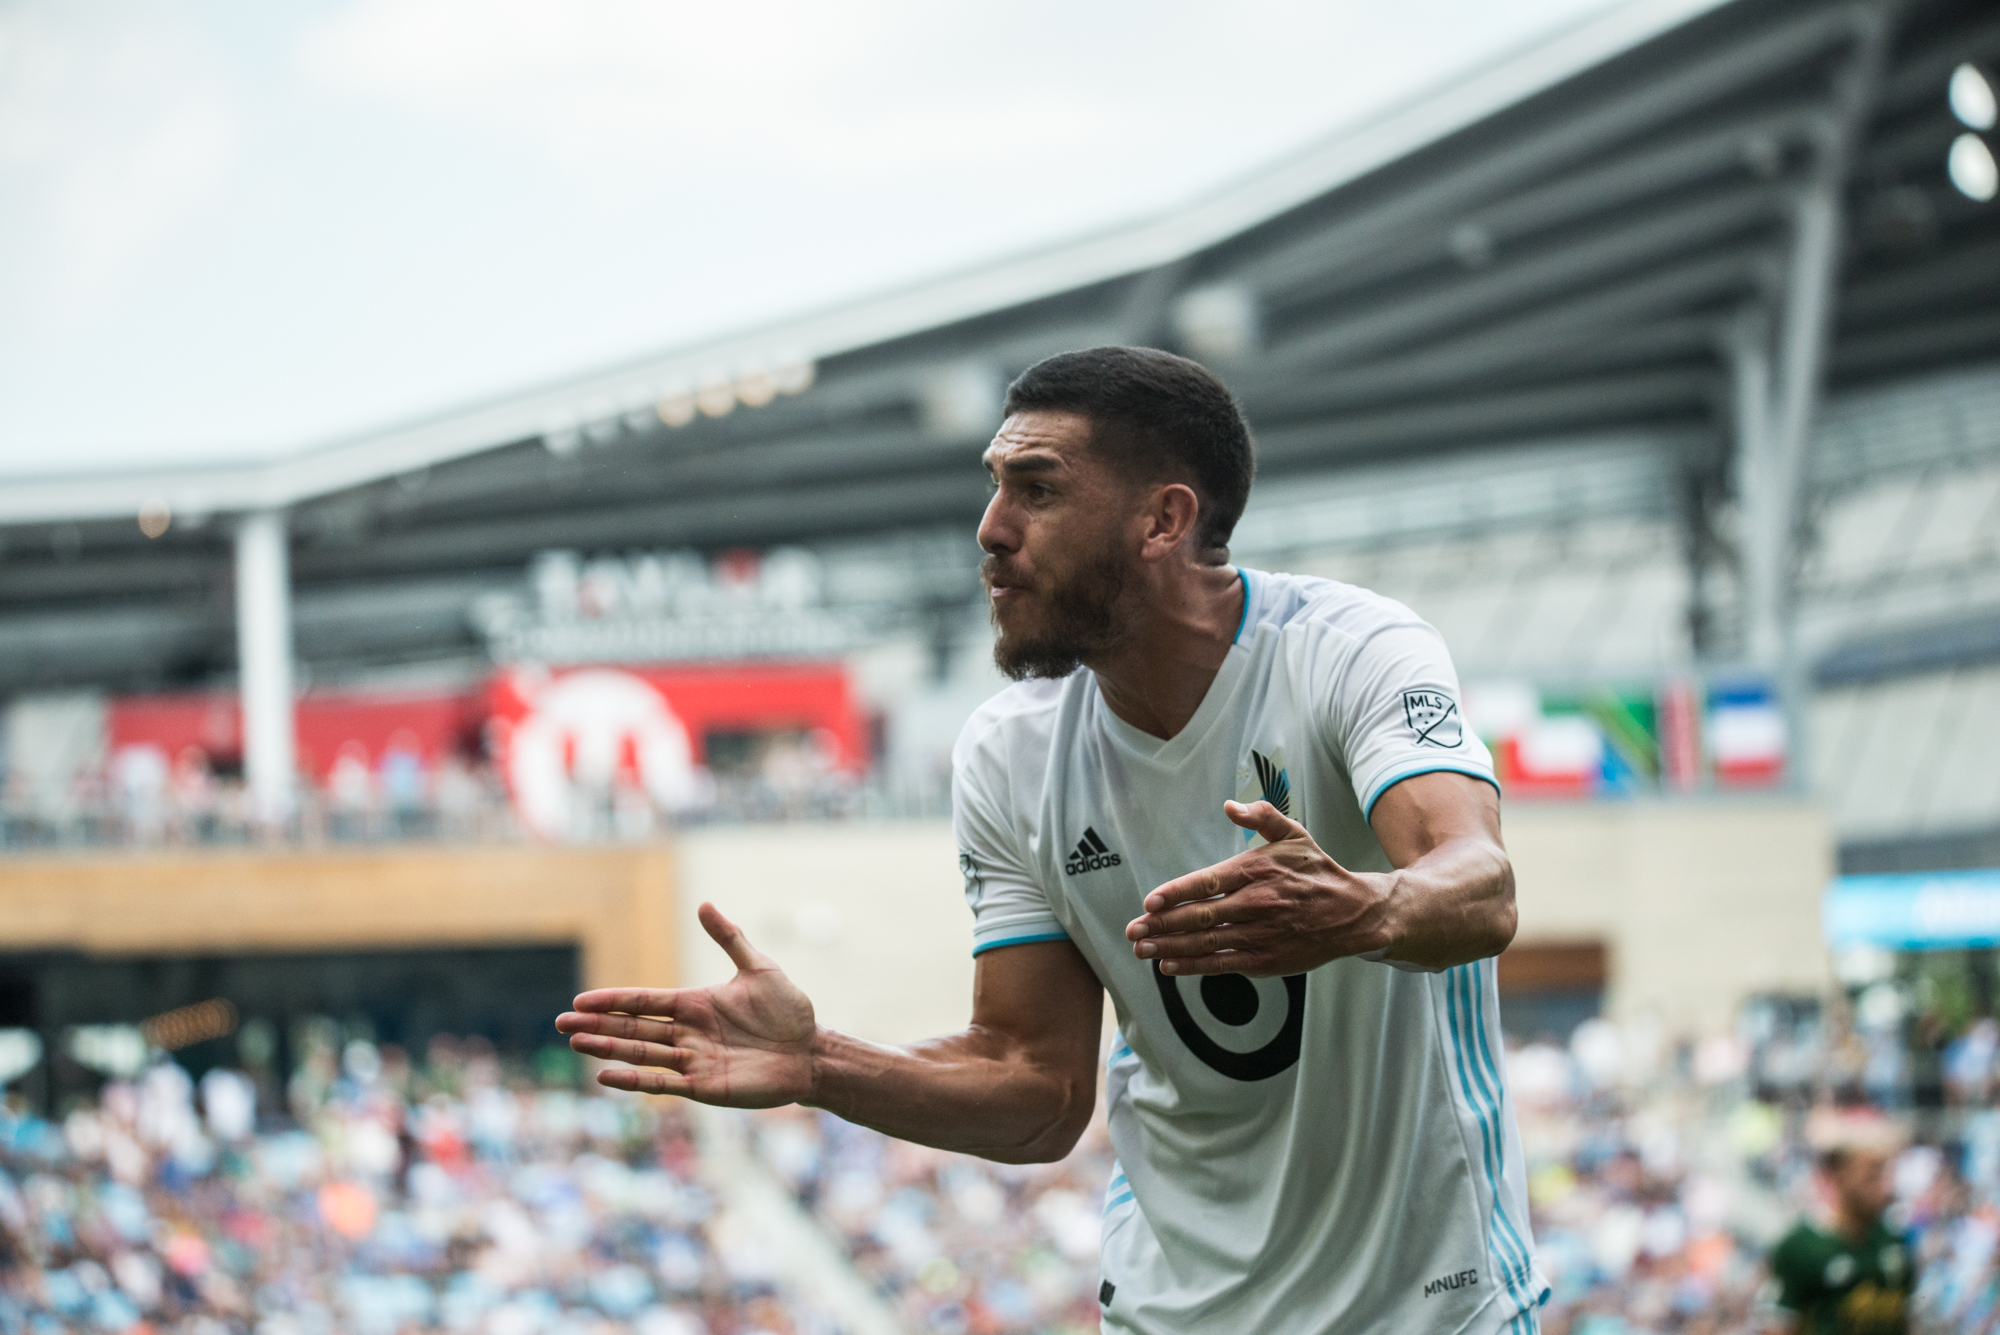 August 4, 2019 - Saint Paul, Minnesota, United States - An MLS match between Minnesota United FC and The Portland Timbers at Allianz Field. (Tim C McLaughlin)